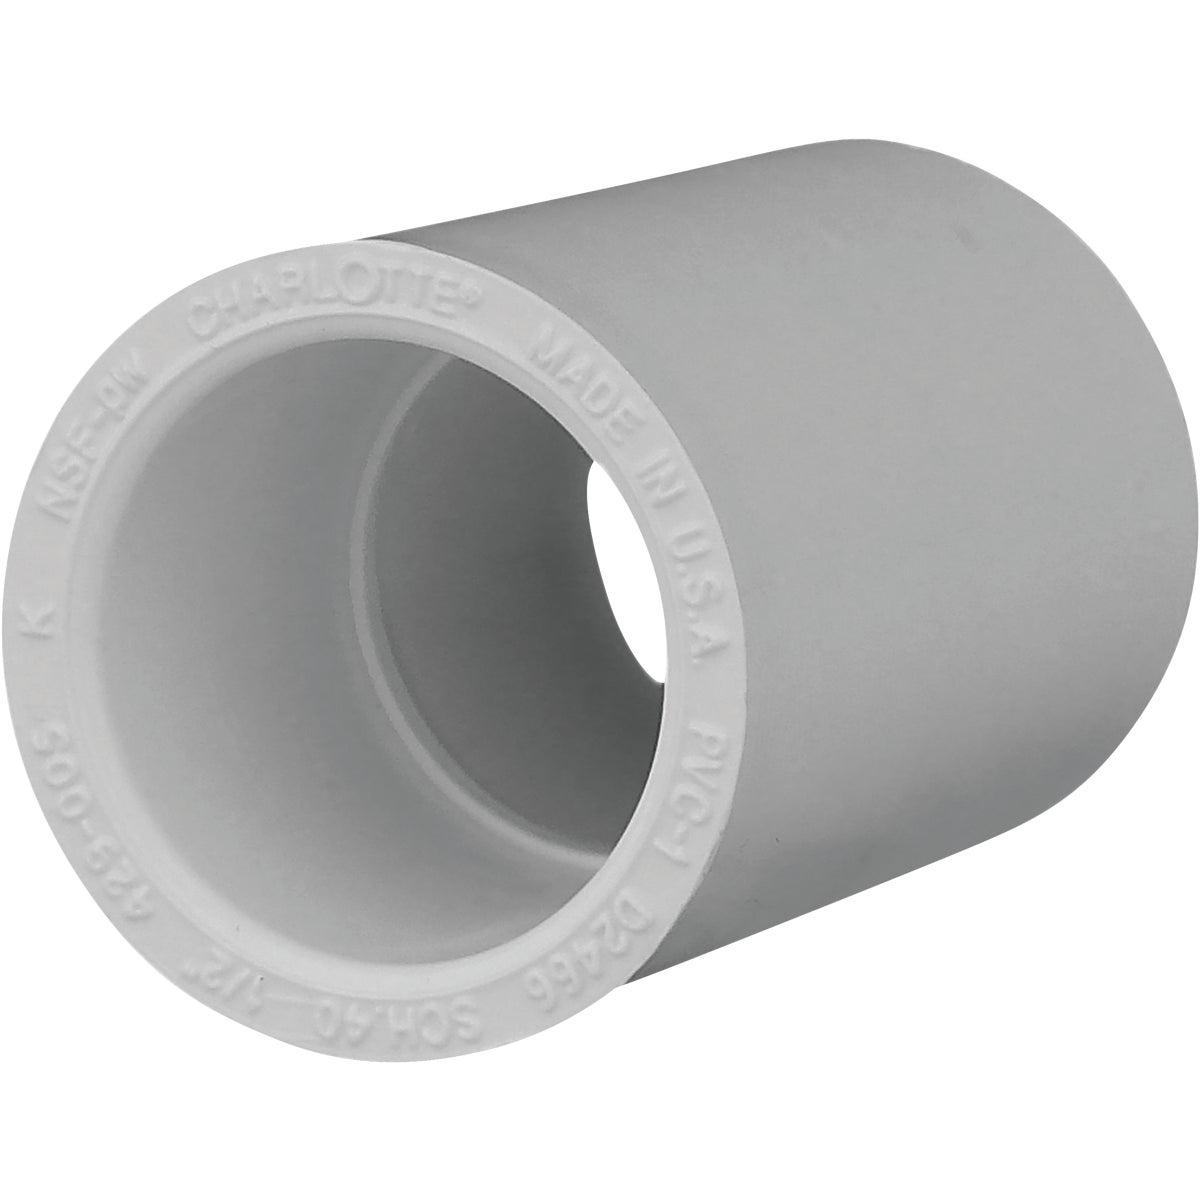 "10PK 1/2"" SCH40 PVC CPLG - 30105CP by Genova Inc"